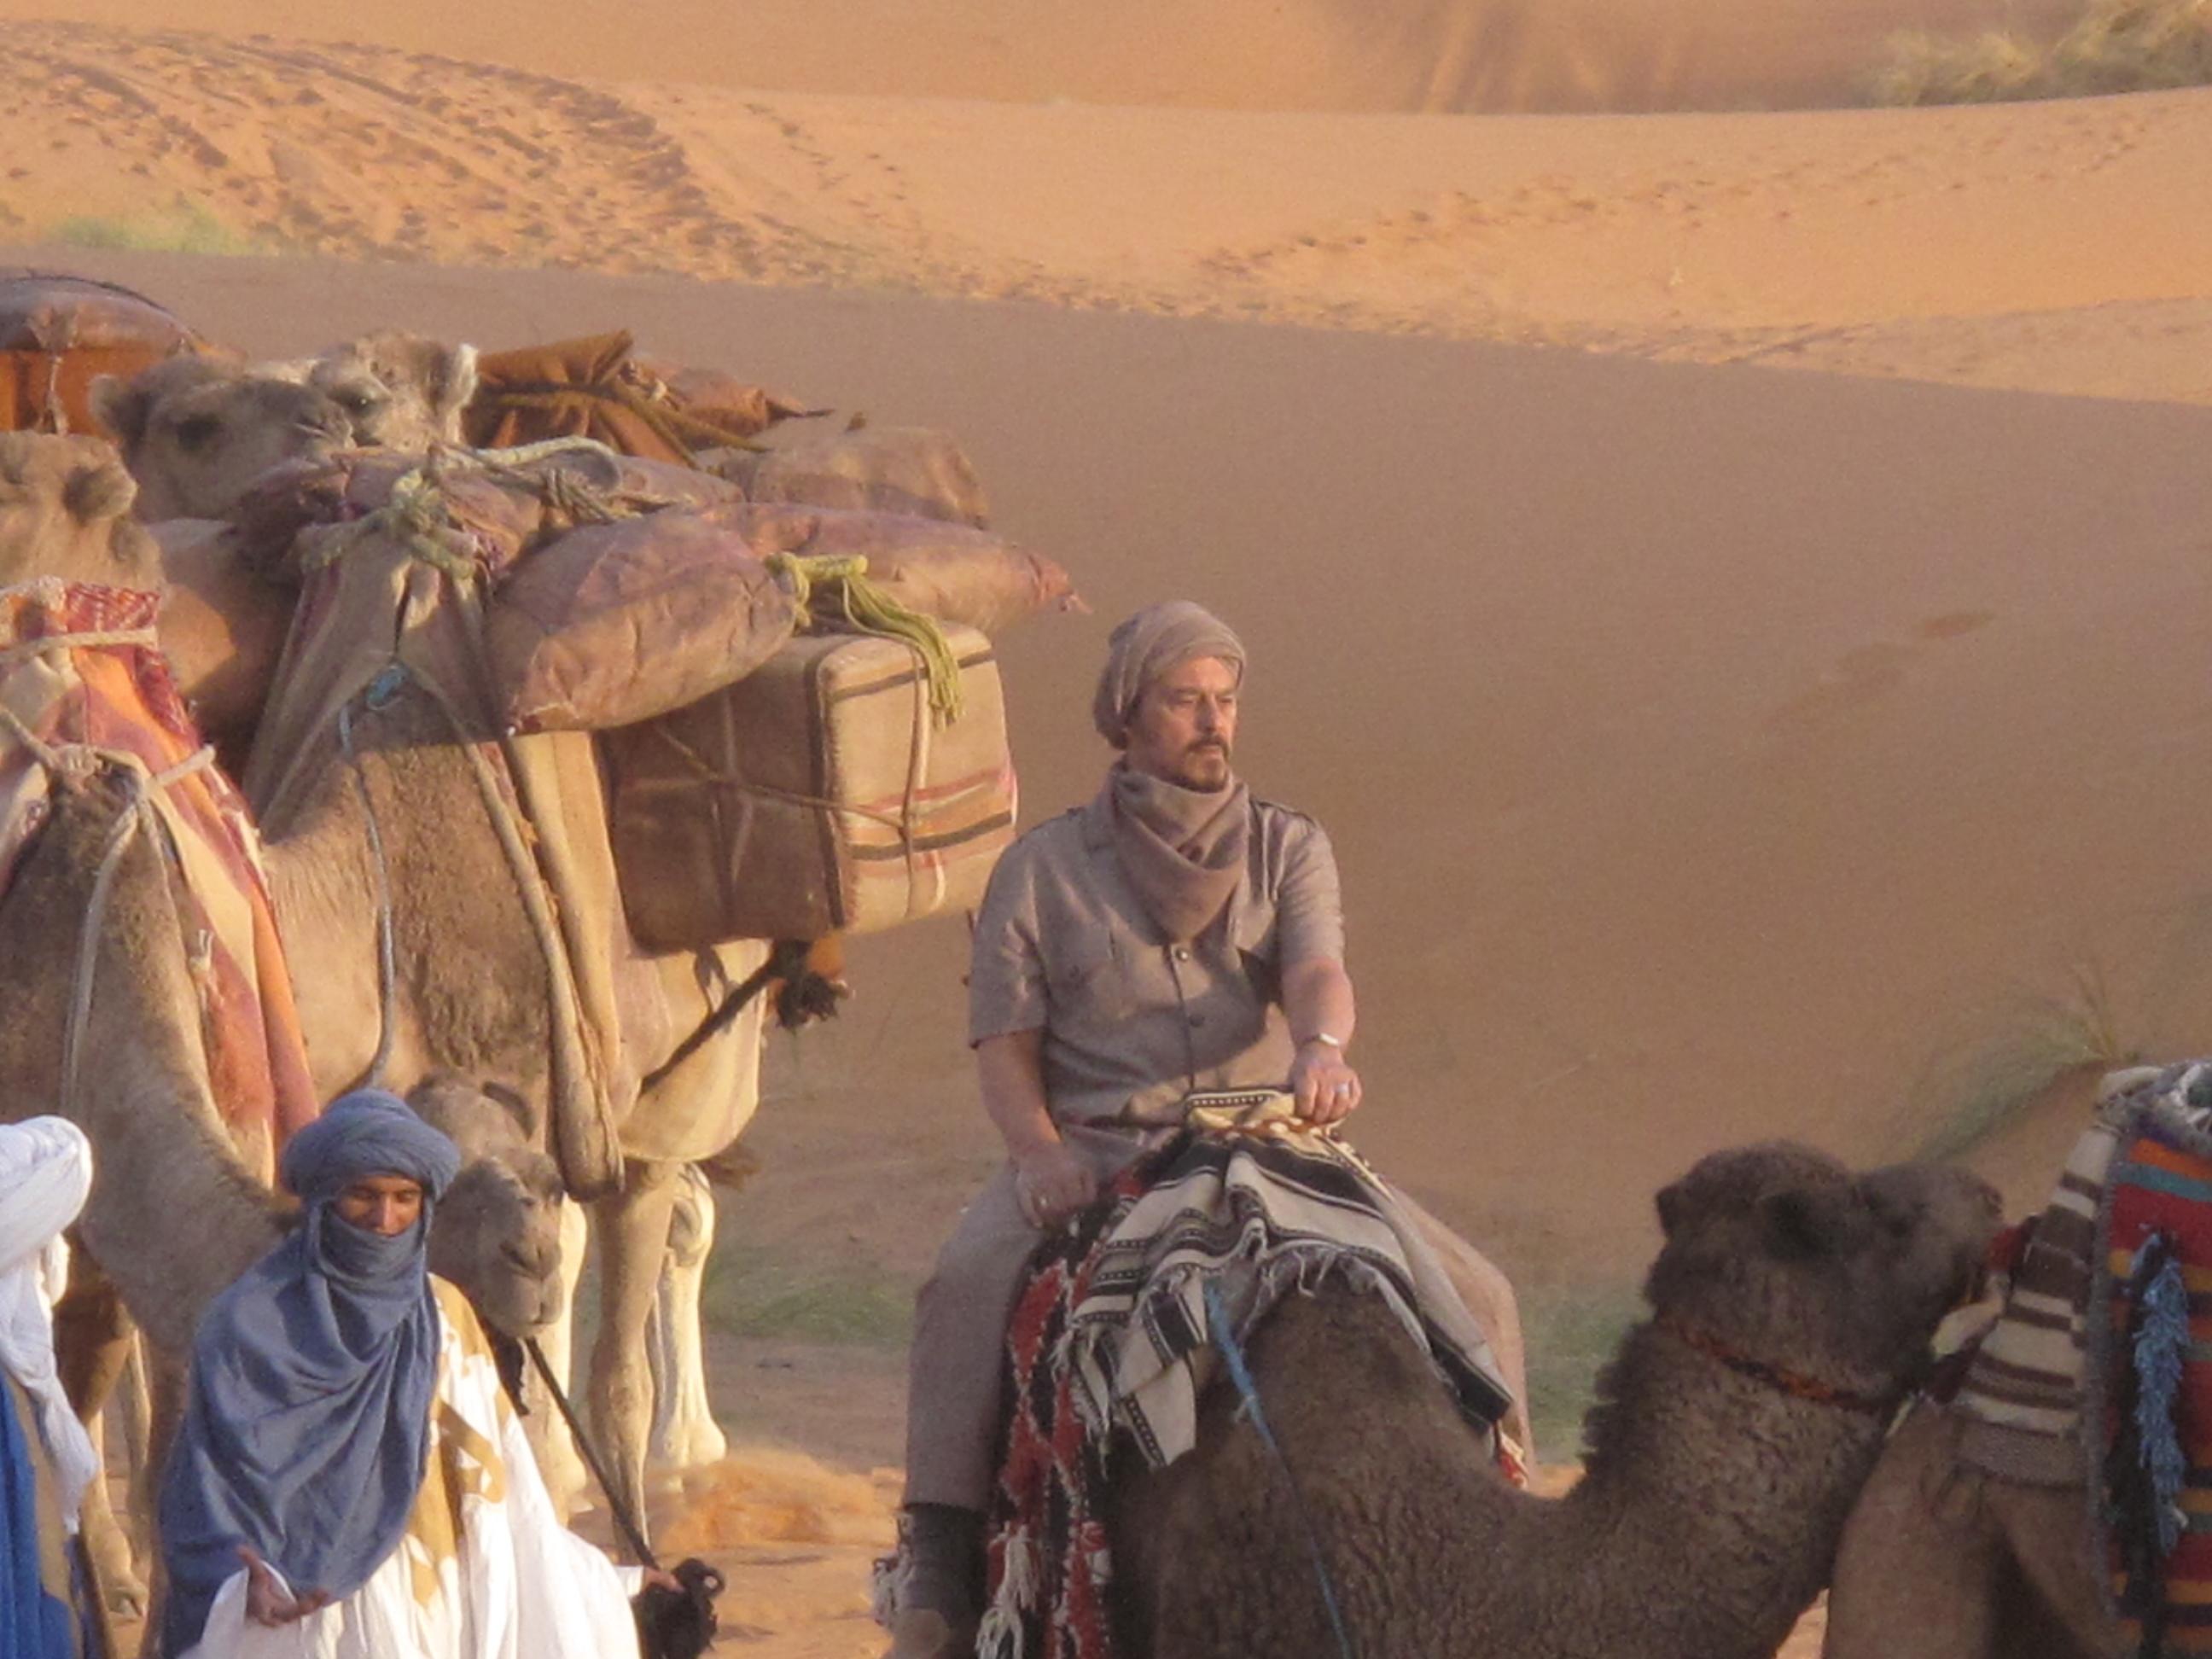 Travesia por el desierto